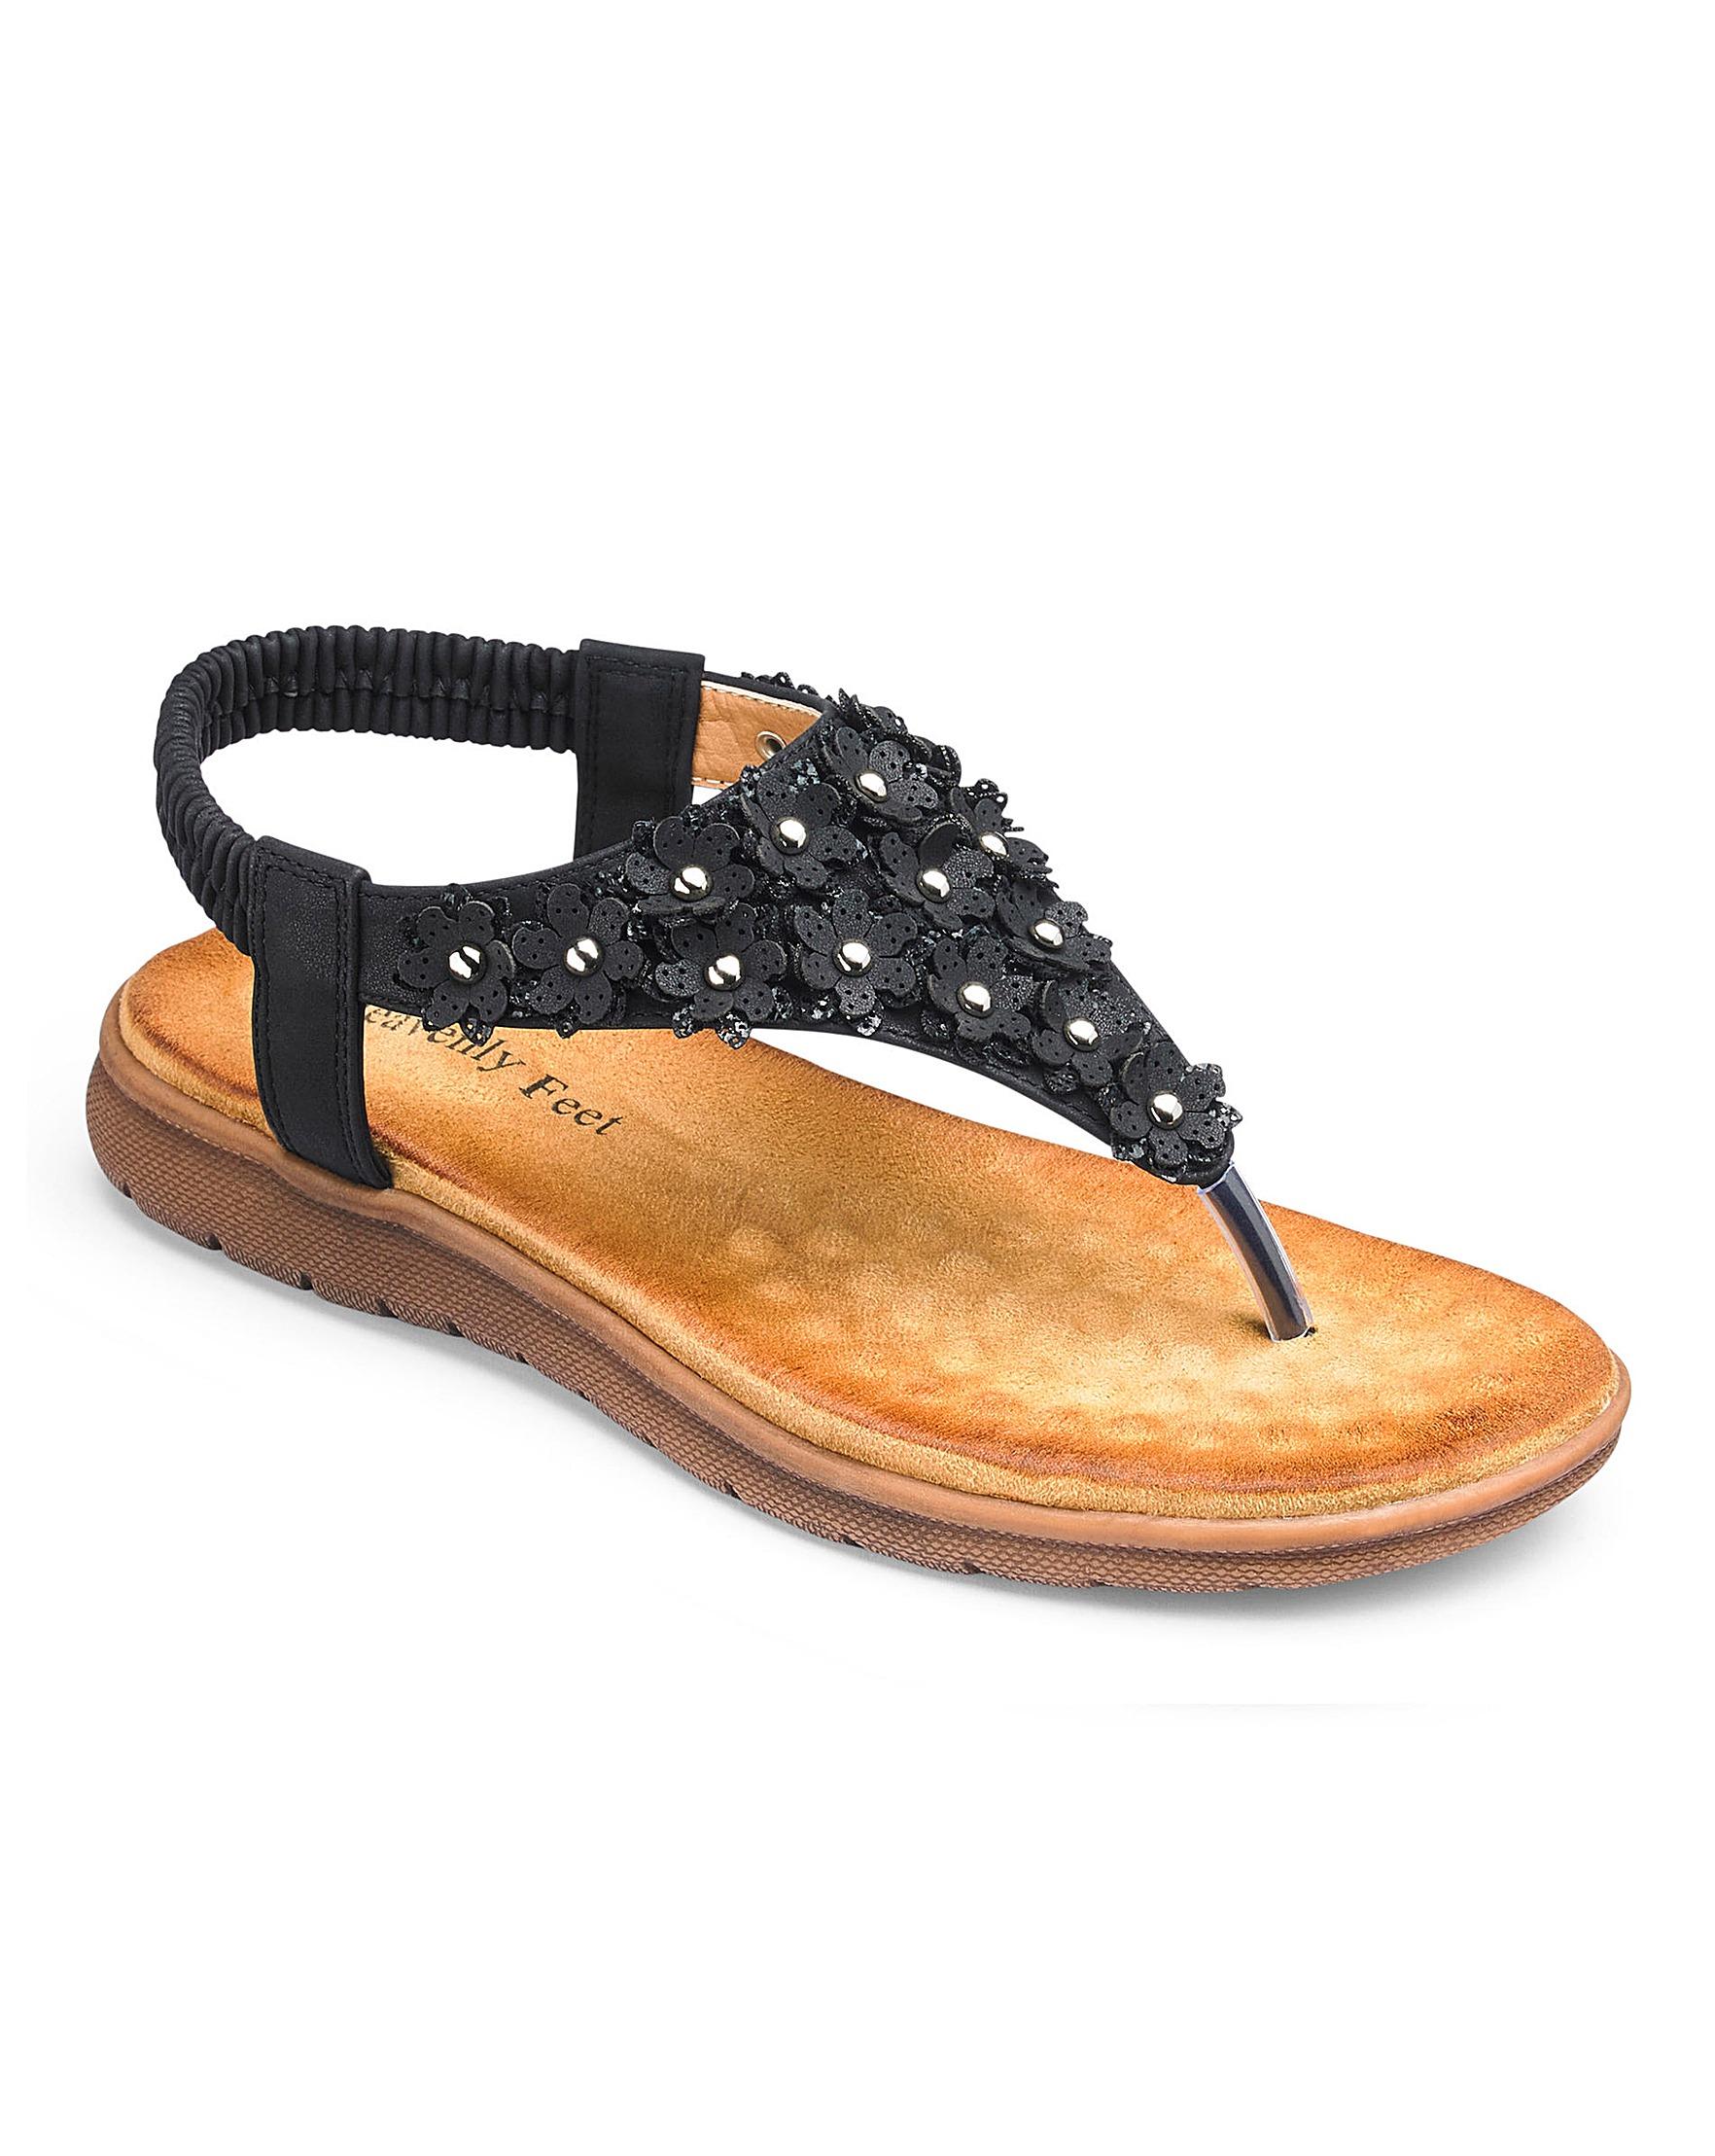 e58e0c76a Heavenly Feet Toe Post Sandals EEE Fit